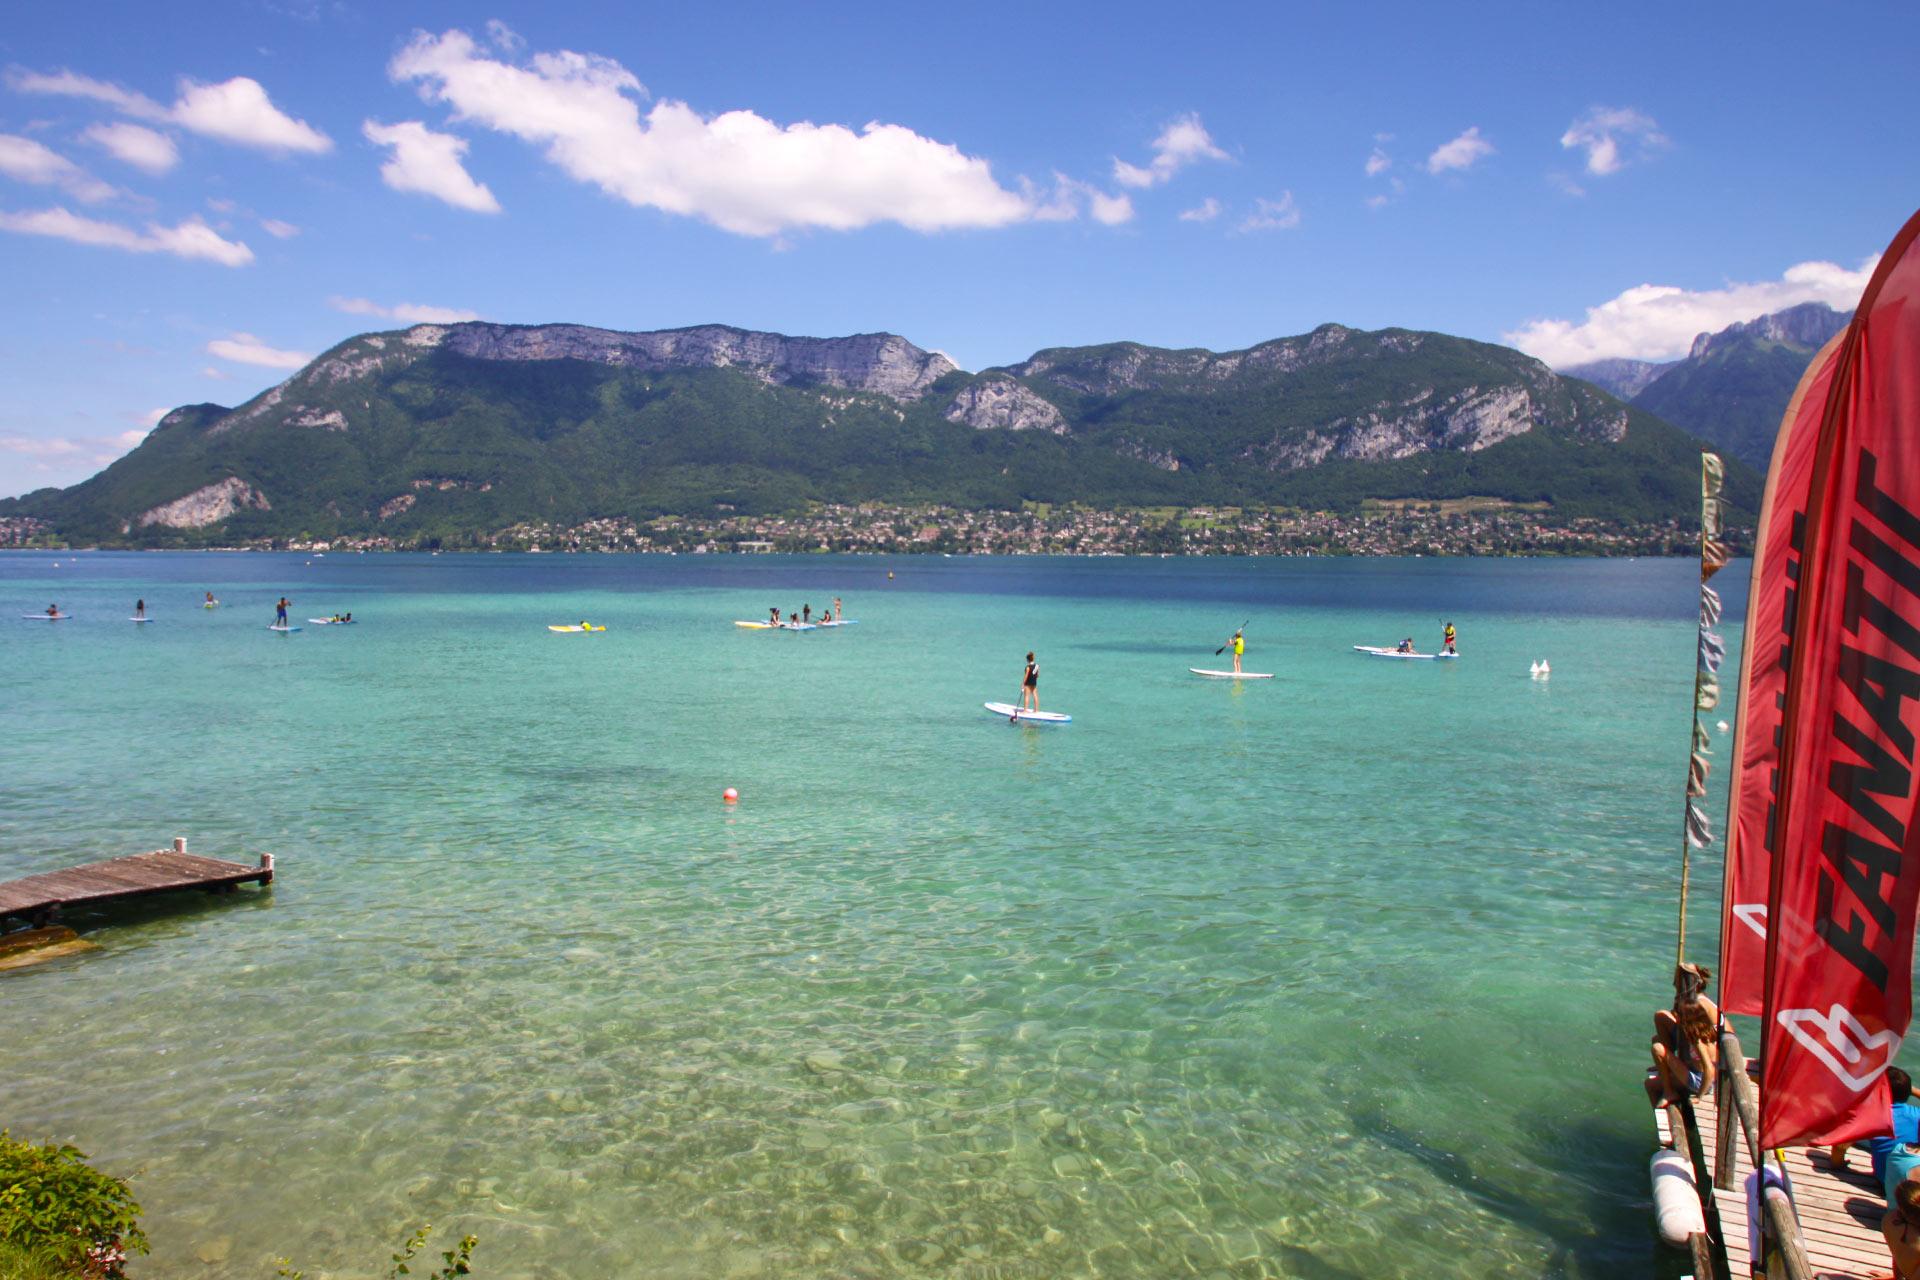 Stand Up Annecy Com Location De Stand Up Paddle Sur Le